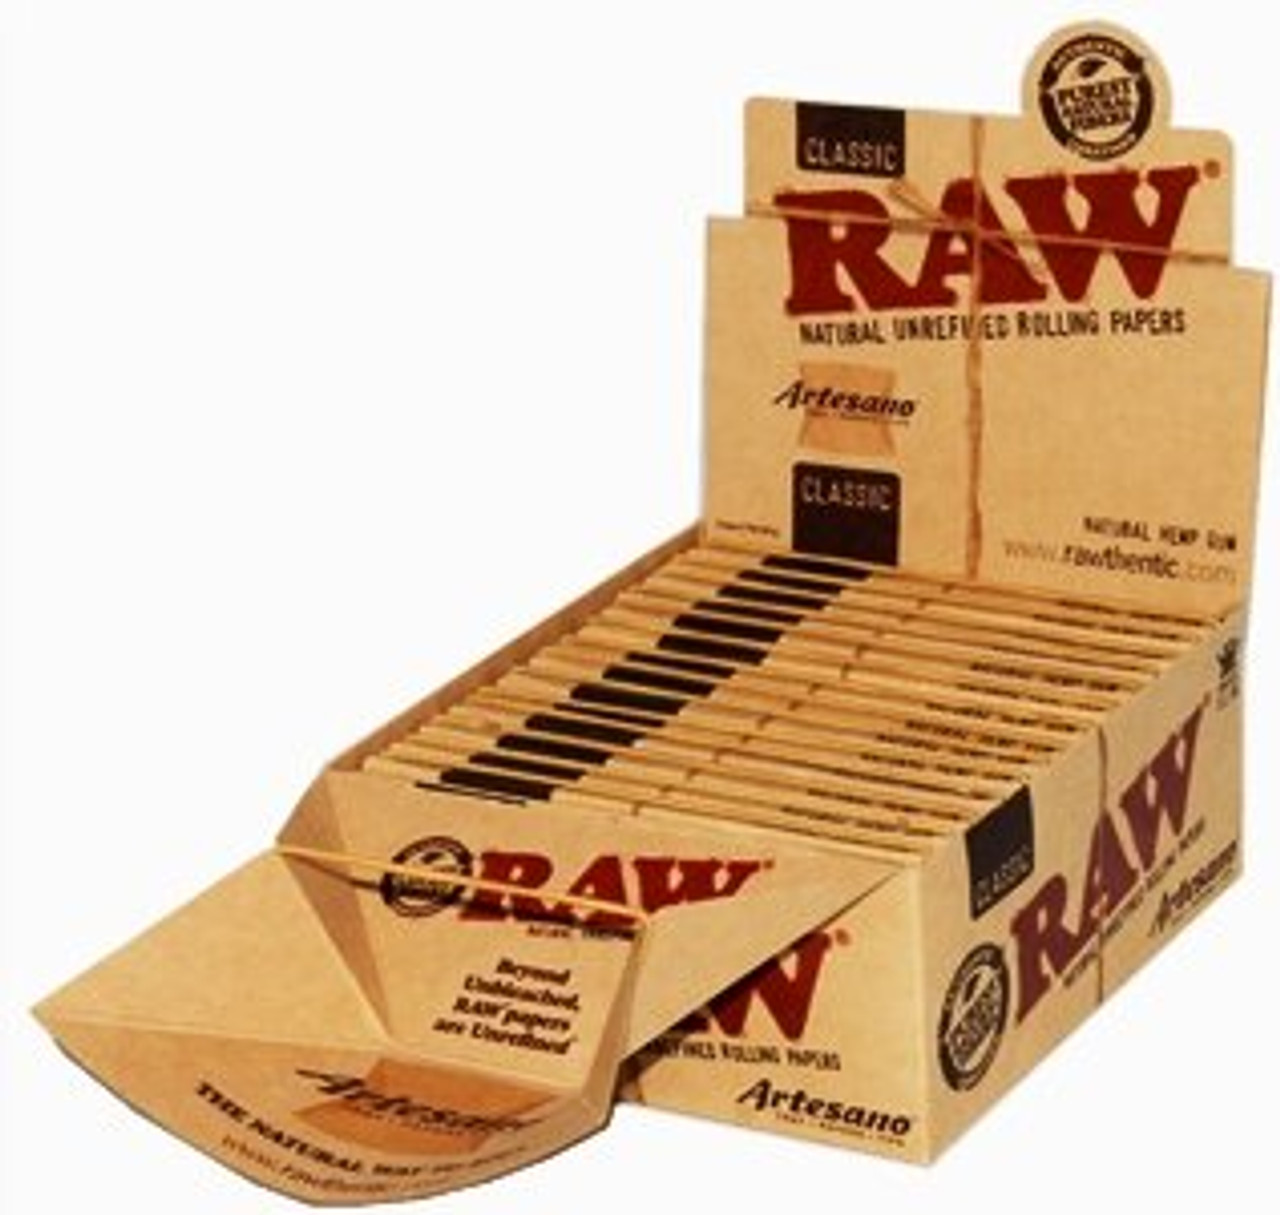 RAW Classic Artesano Kingsize Slim Box of 15 Packs